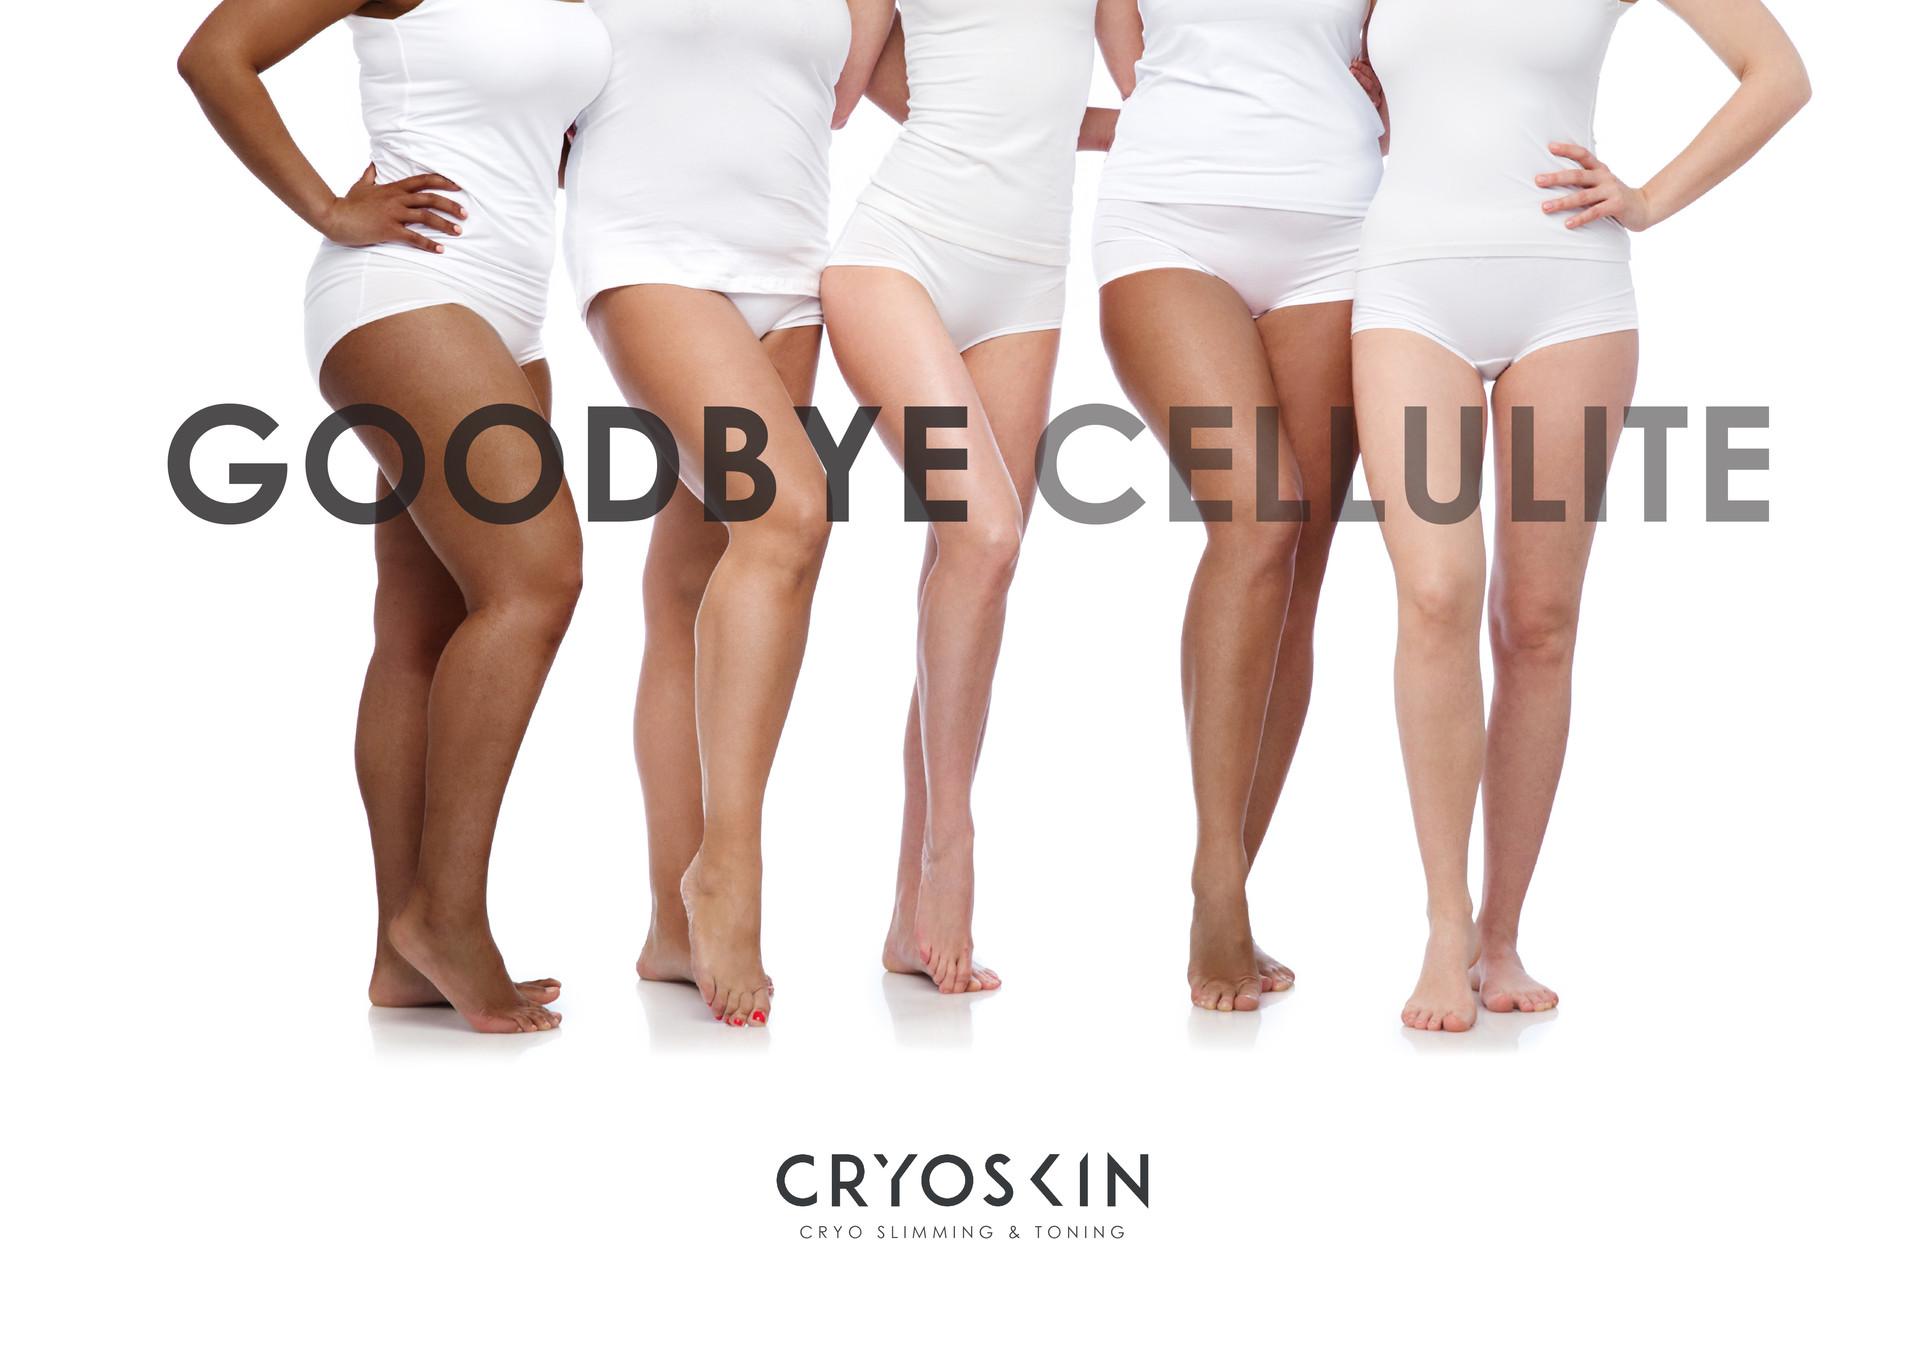 Cryoskin_CaseStudy-01.jpg